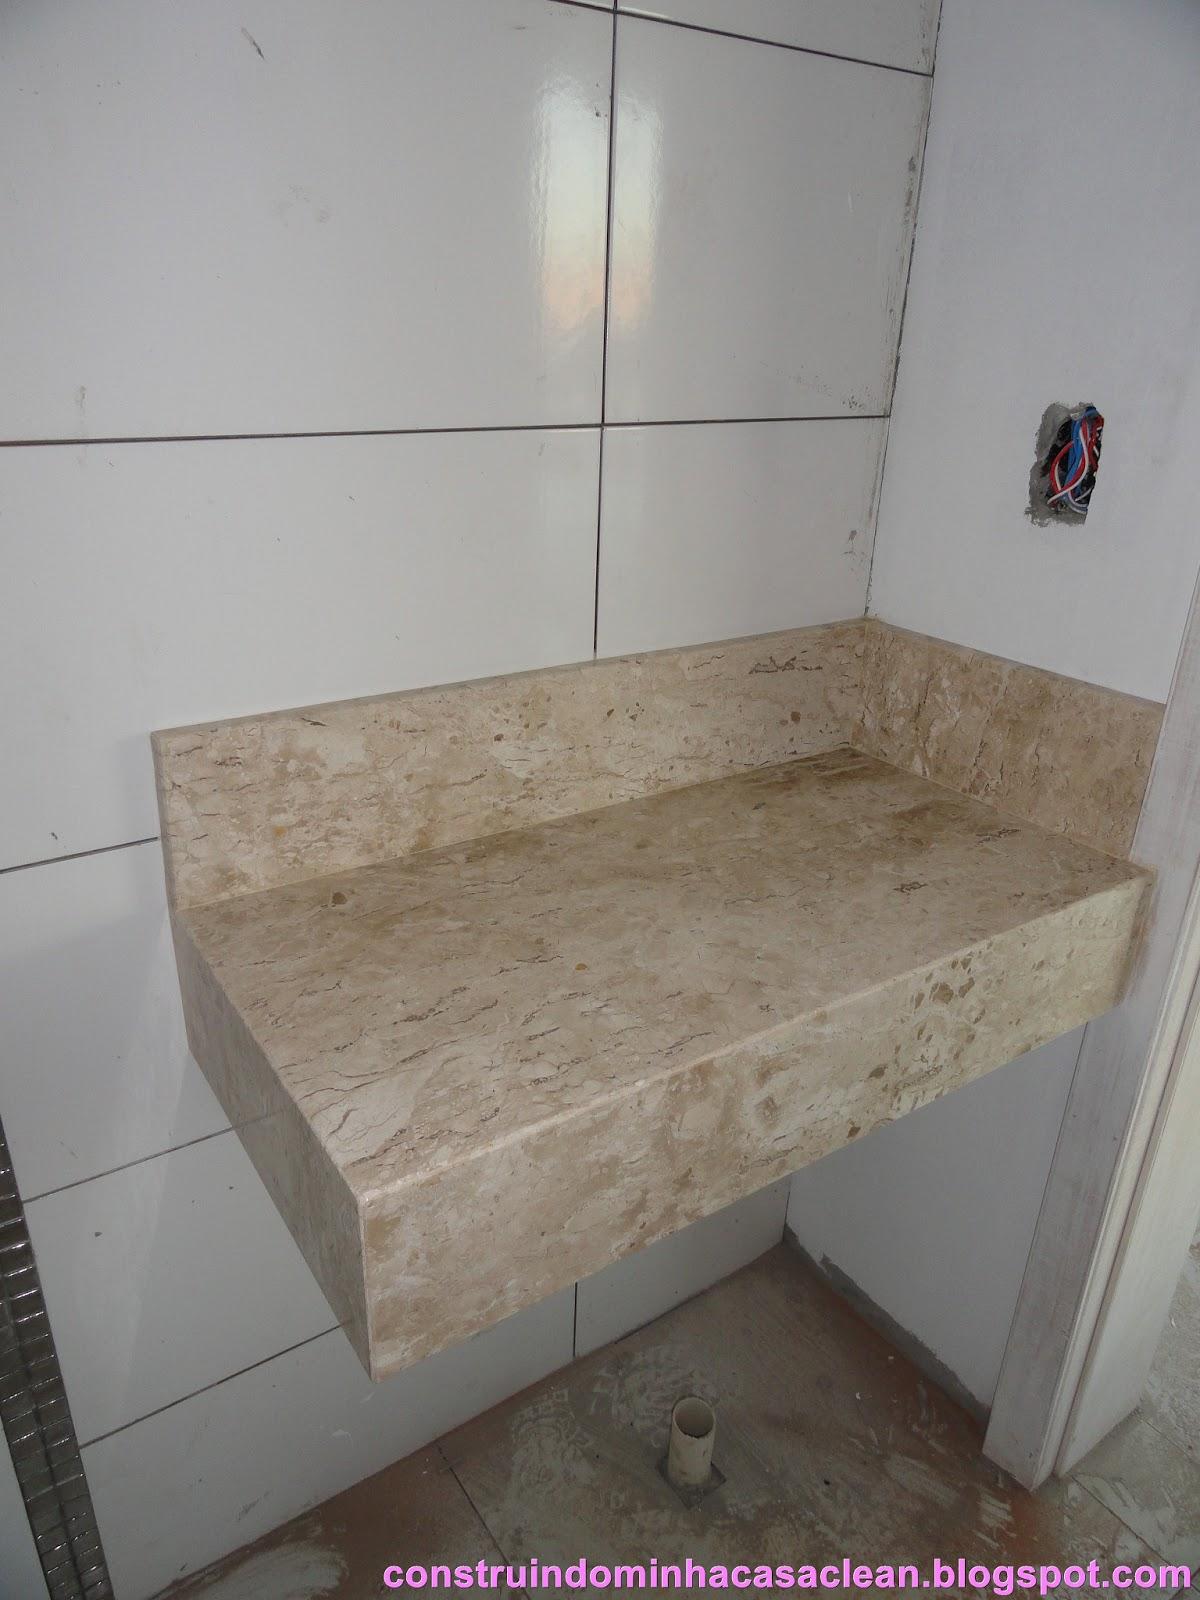 banheiro travertino:Construindo Minha Casa Clean: Meus Banheiros  #8C3F89 1200x1600 Bancada Banheiro Marmore Travertino